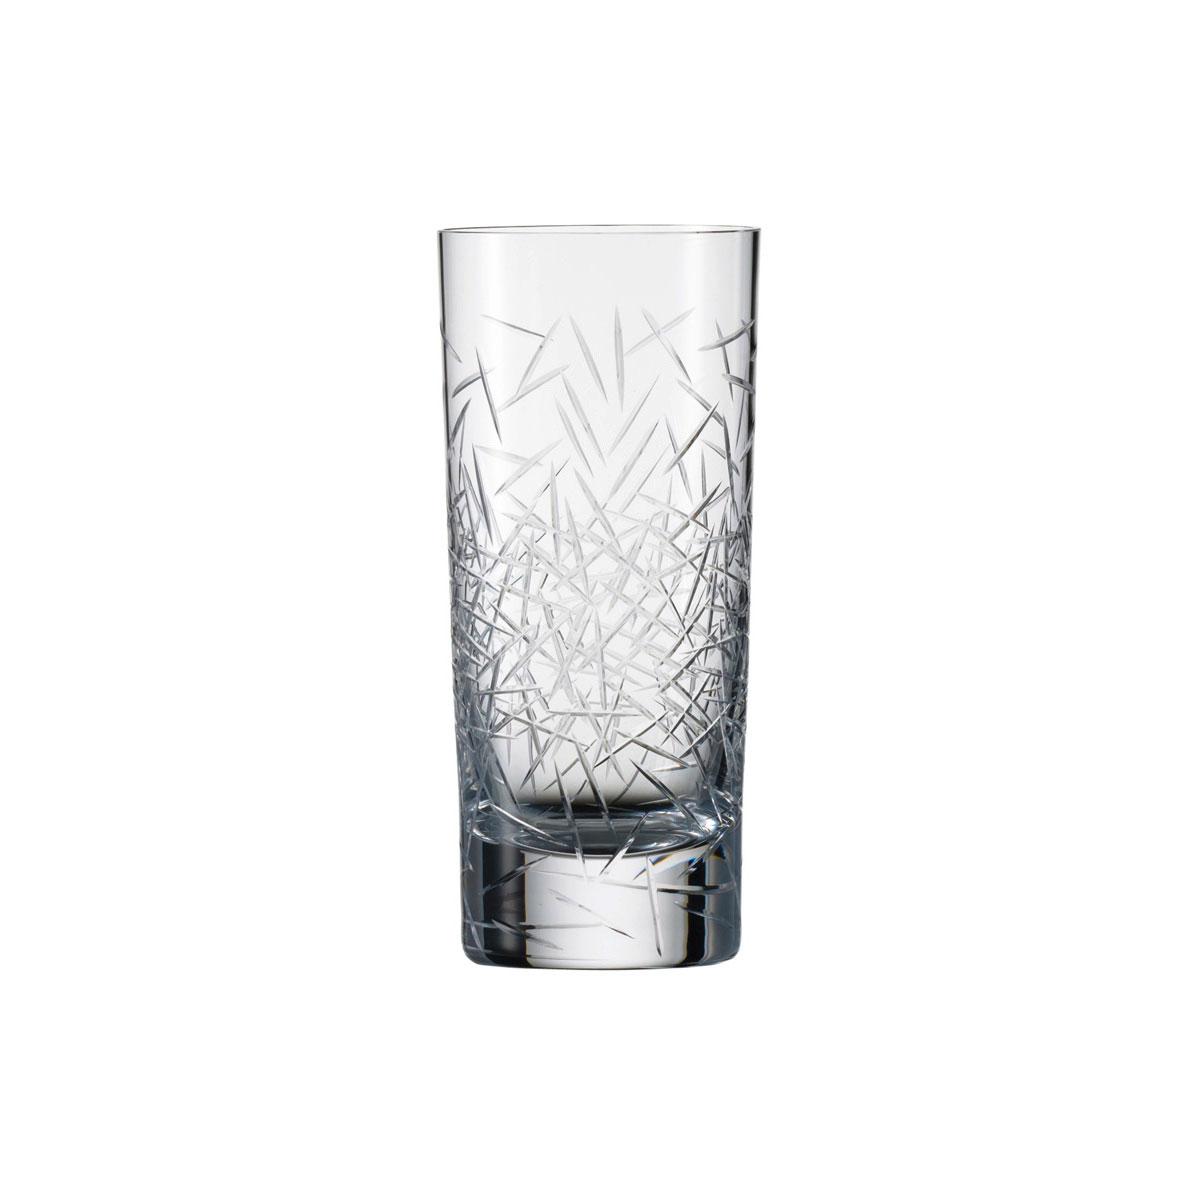 Schott Zwiesel Tritan Crystal, 1872 Charles Schumann Hommage Glace Longdrink Large, Single